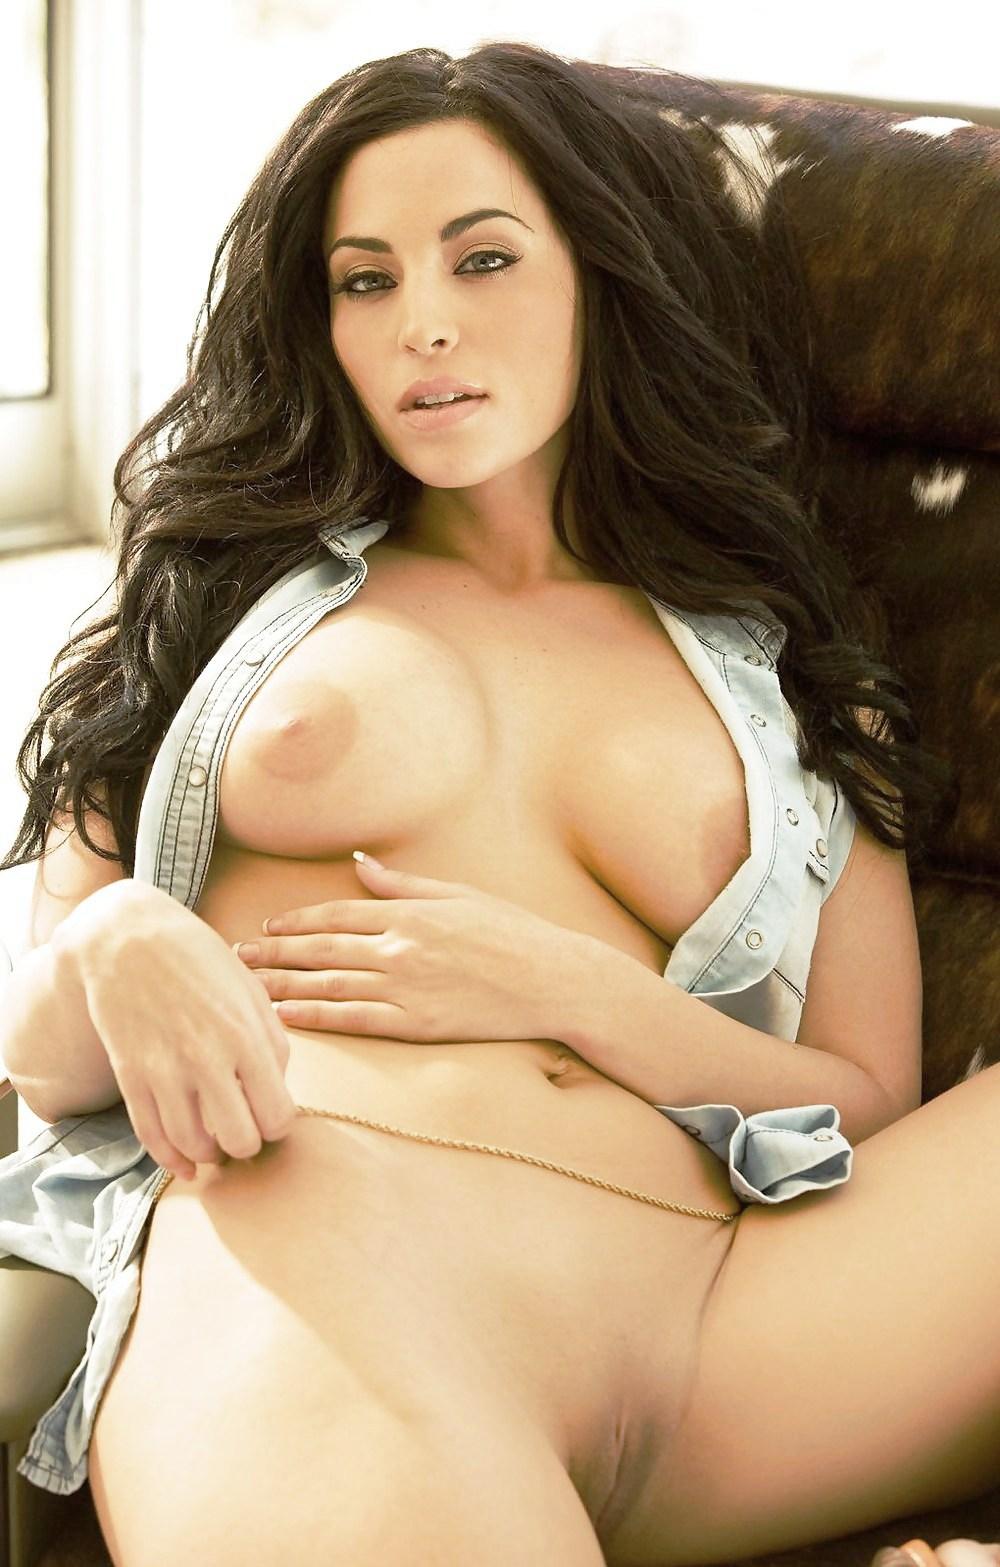 Hot Busty Wife Porn